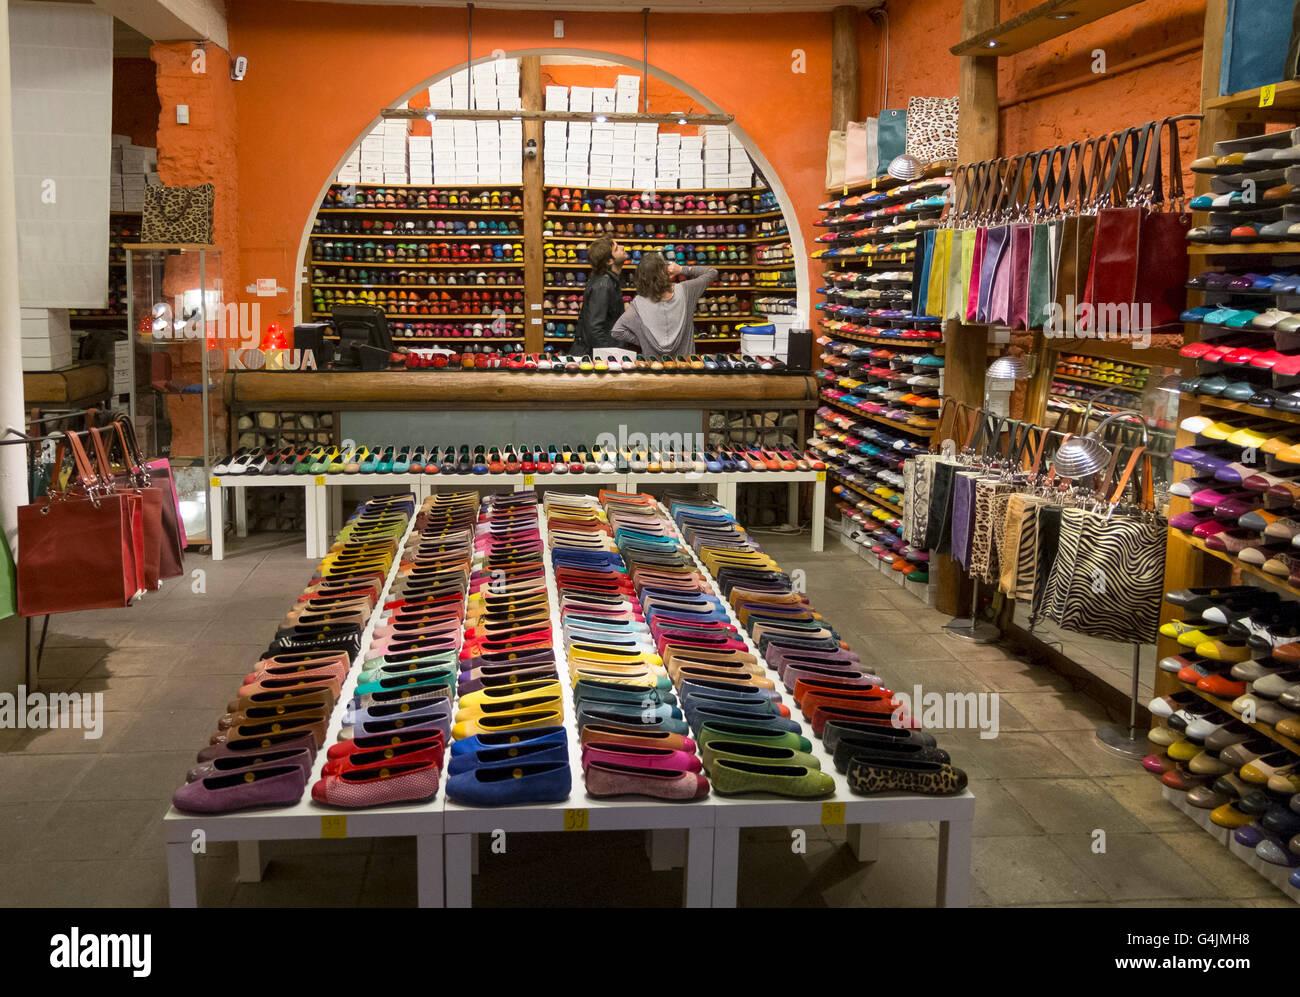 00ac9b3460e22 Barcelona Shoe Shop Stock Photos   Barcelona Shoe Shop Stock Images ...